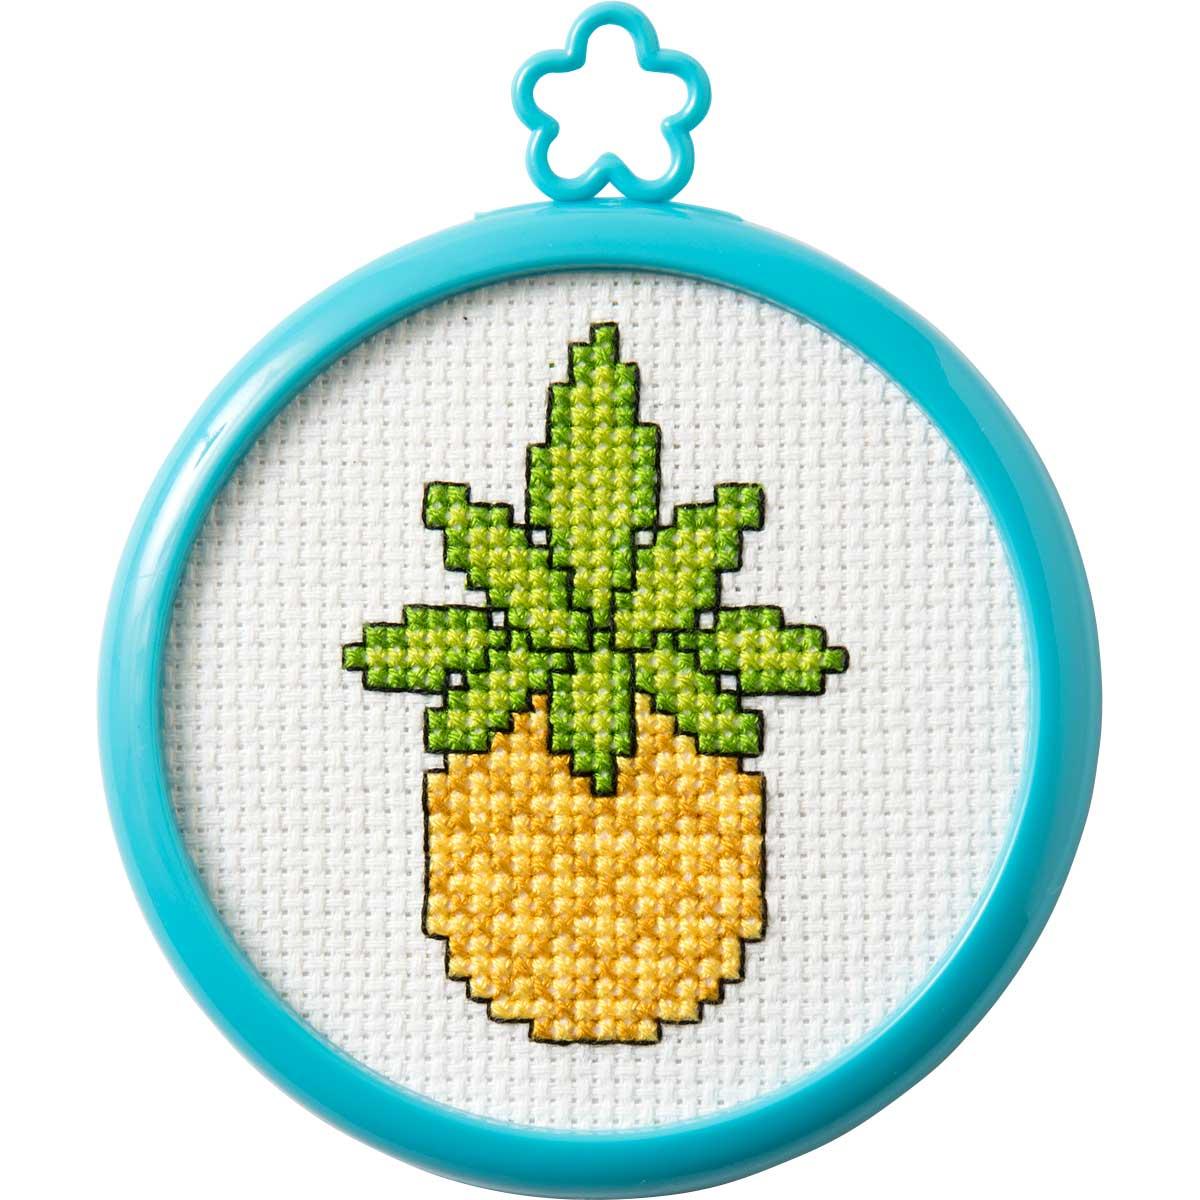 Bucilla ® My 1st Stitch™ - Counted Cross Stitch Kits - Mini - Tropical Pineapple - WM47815E